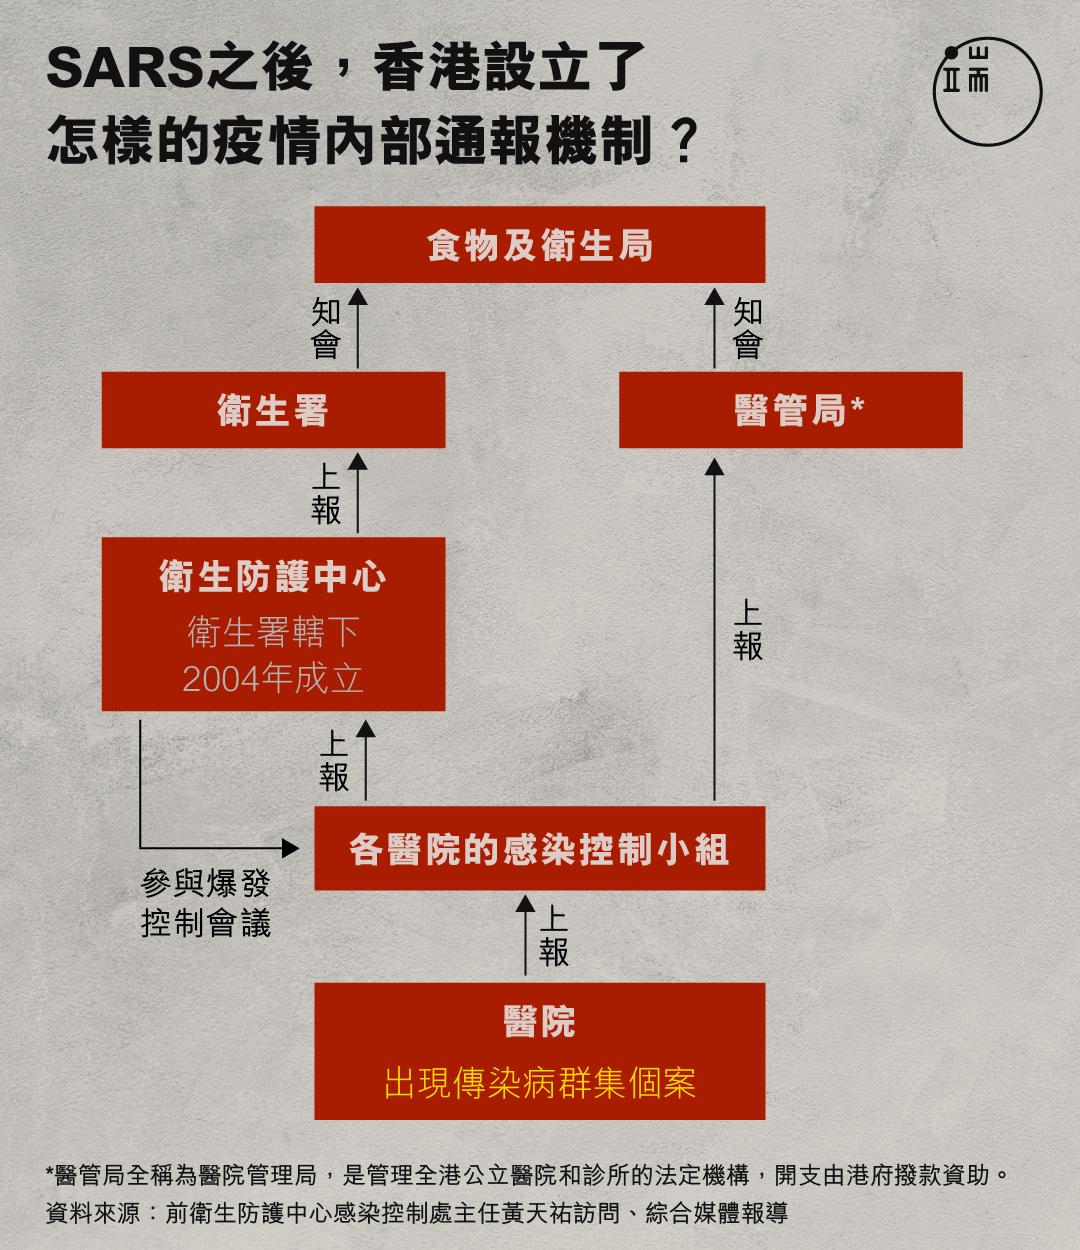 SARS之後,香港設立了怎樣的疫情內部通報機制?